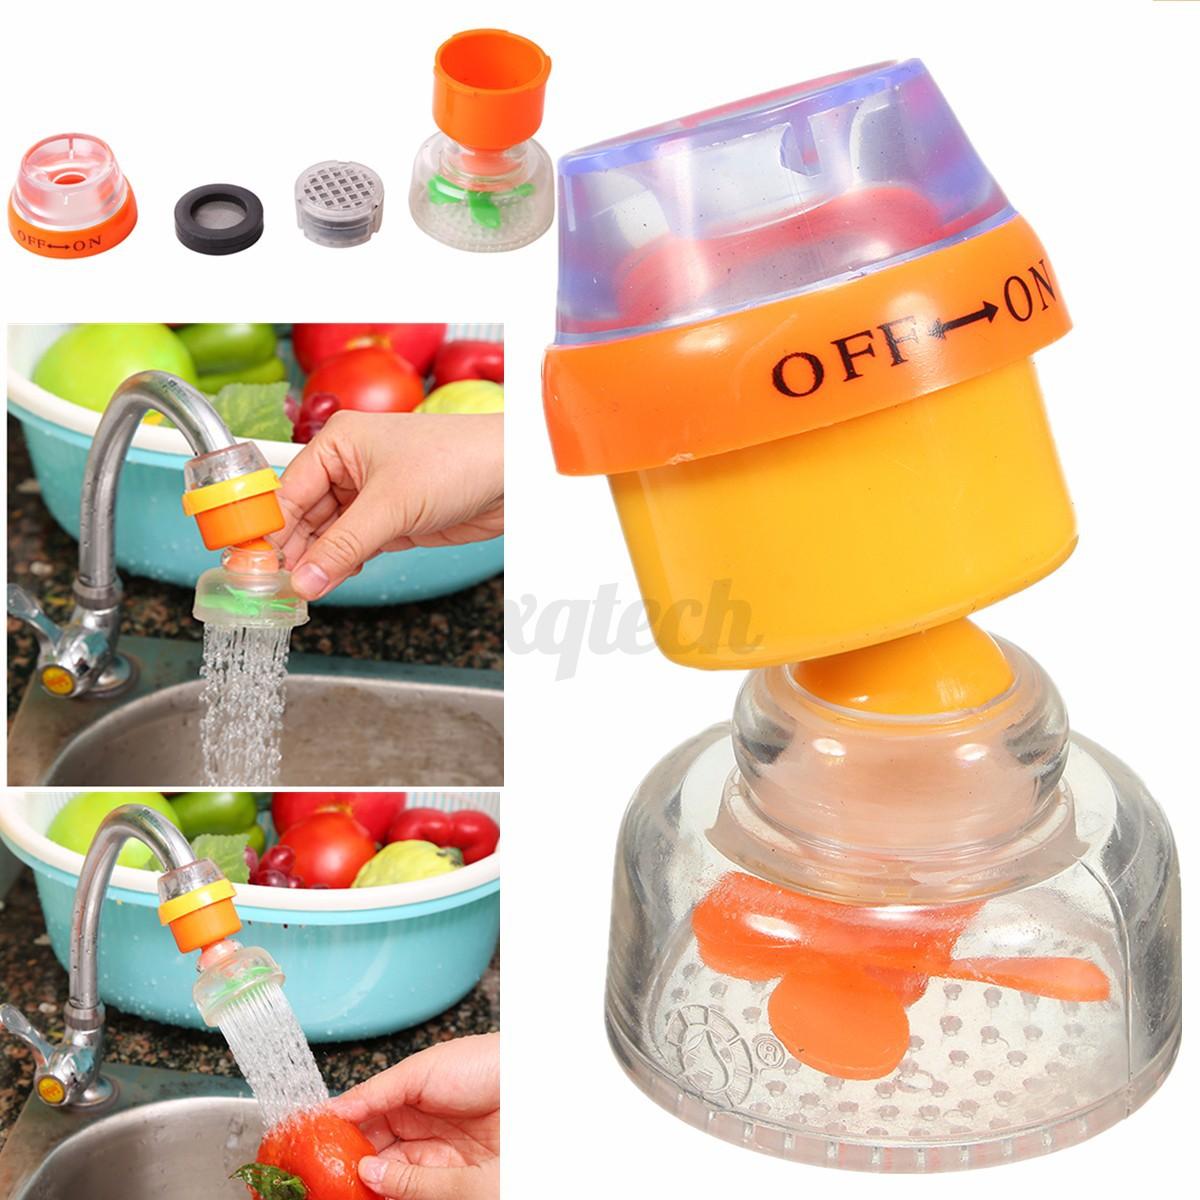 kitchen in line shower bath head purifier water filter health remove chlorine. Black Bedroom Furniture Sets. Home Design Ideas